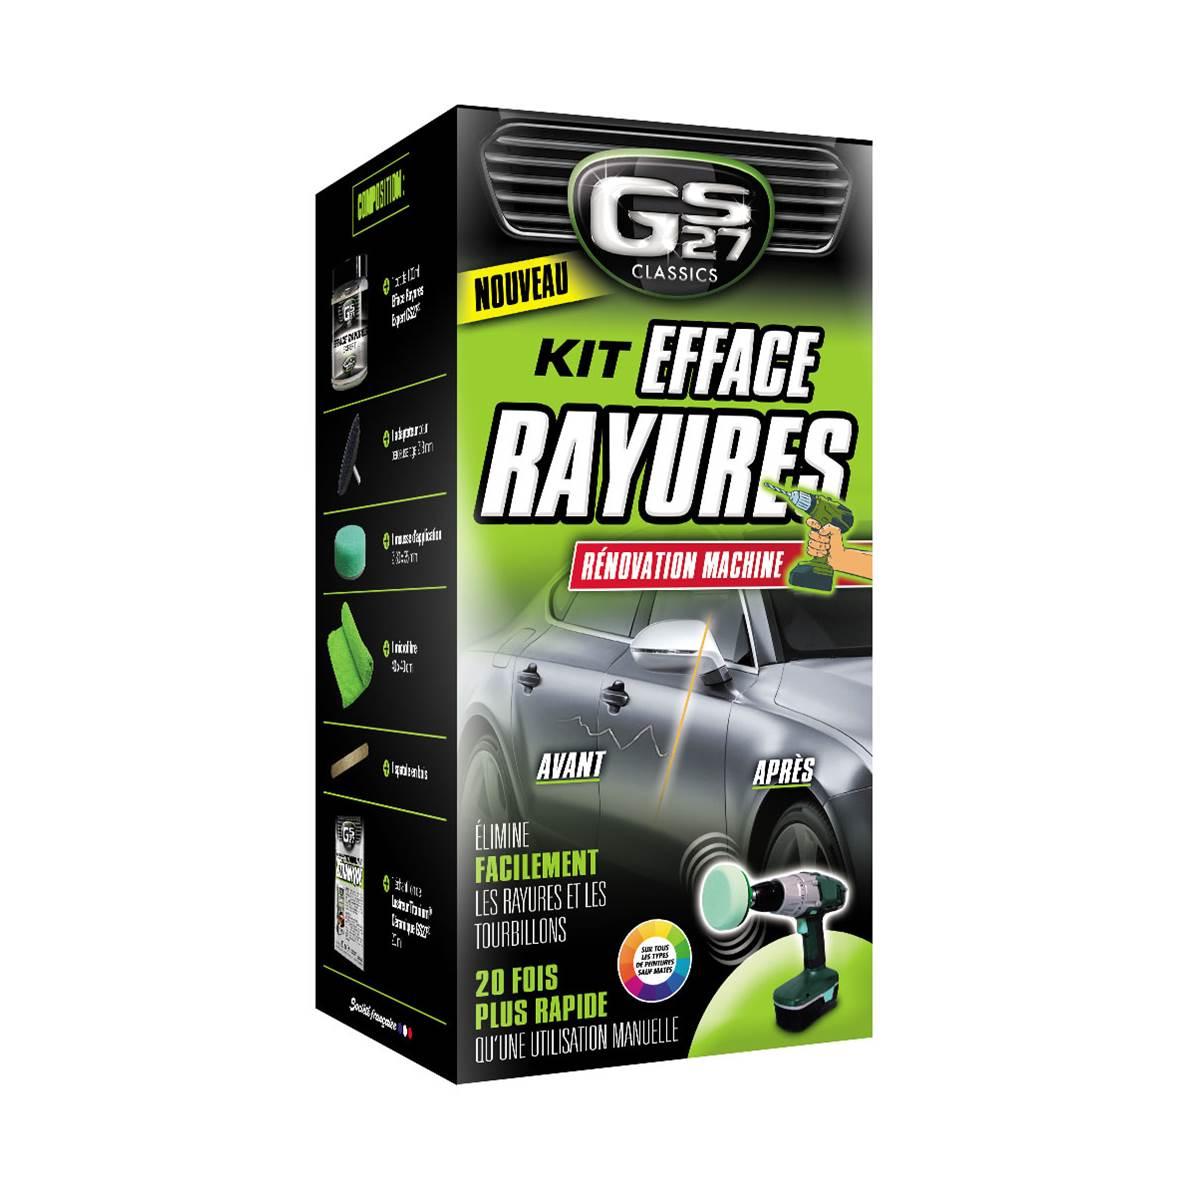 Kit Efface Rayures Rénovation Machine GS27